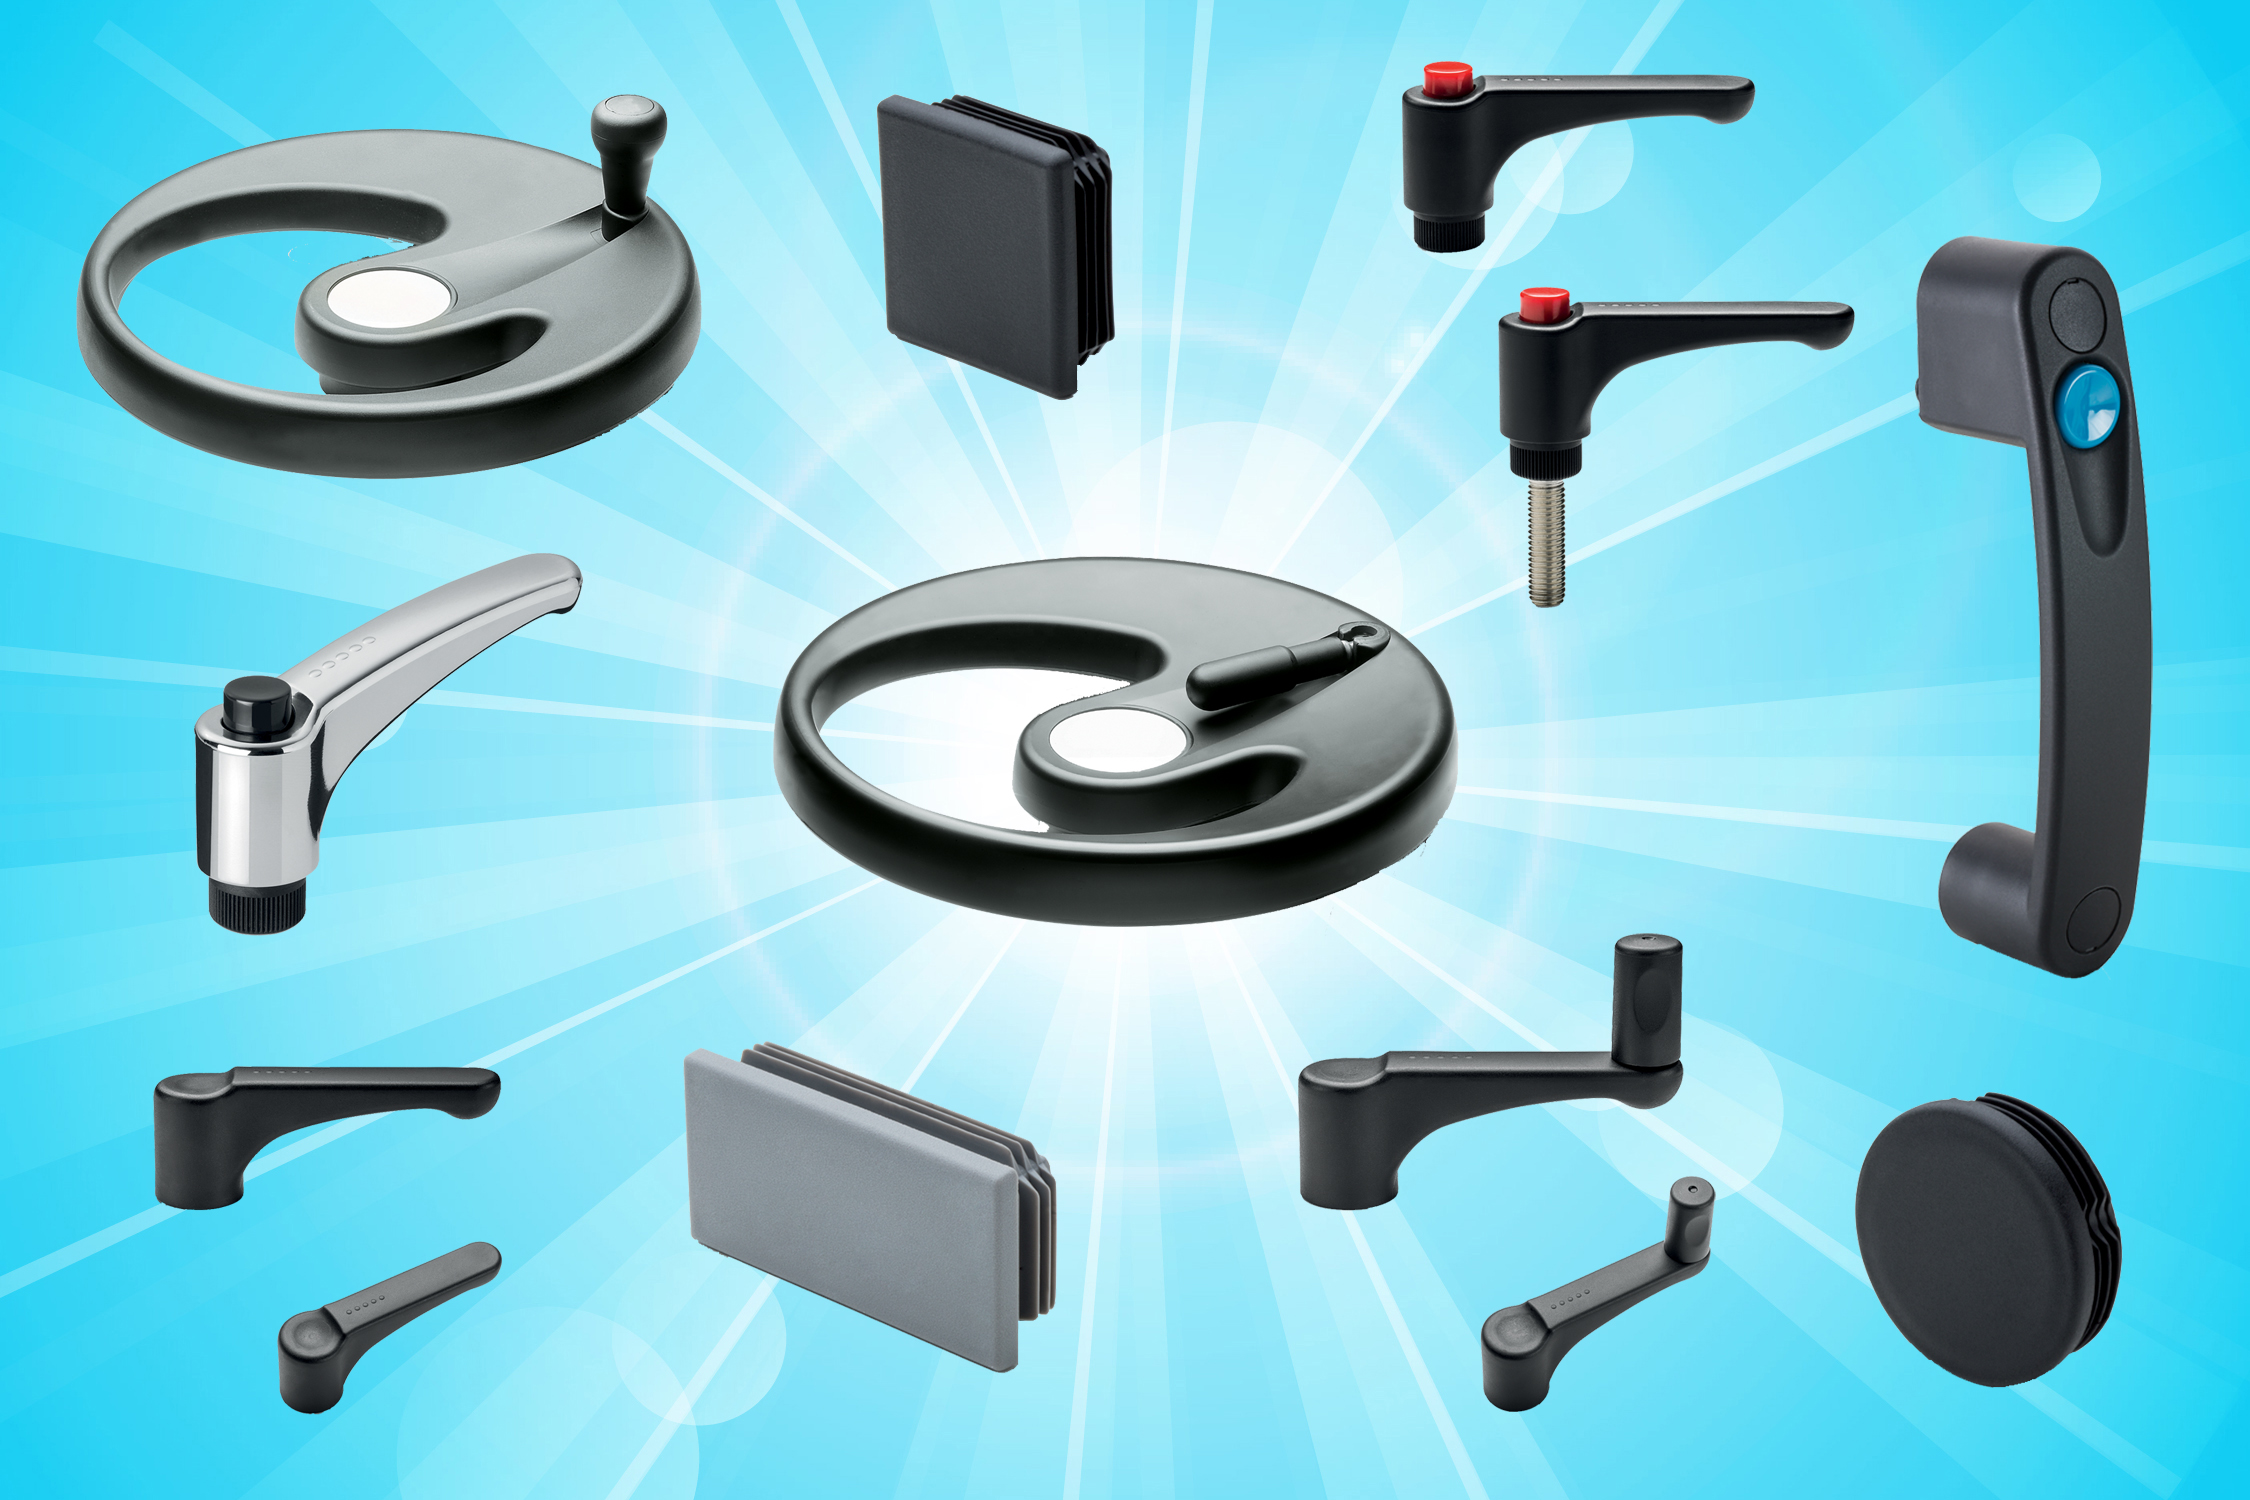 Elesa Ergostyle® brings comfort and style to standard machine elements